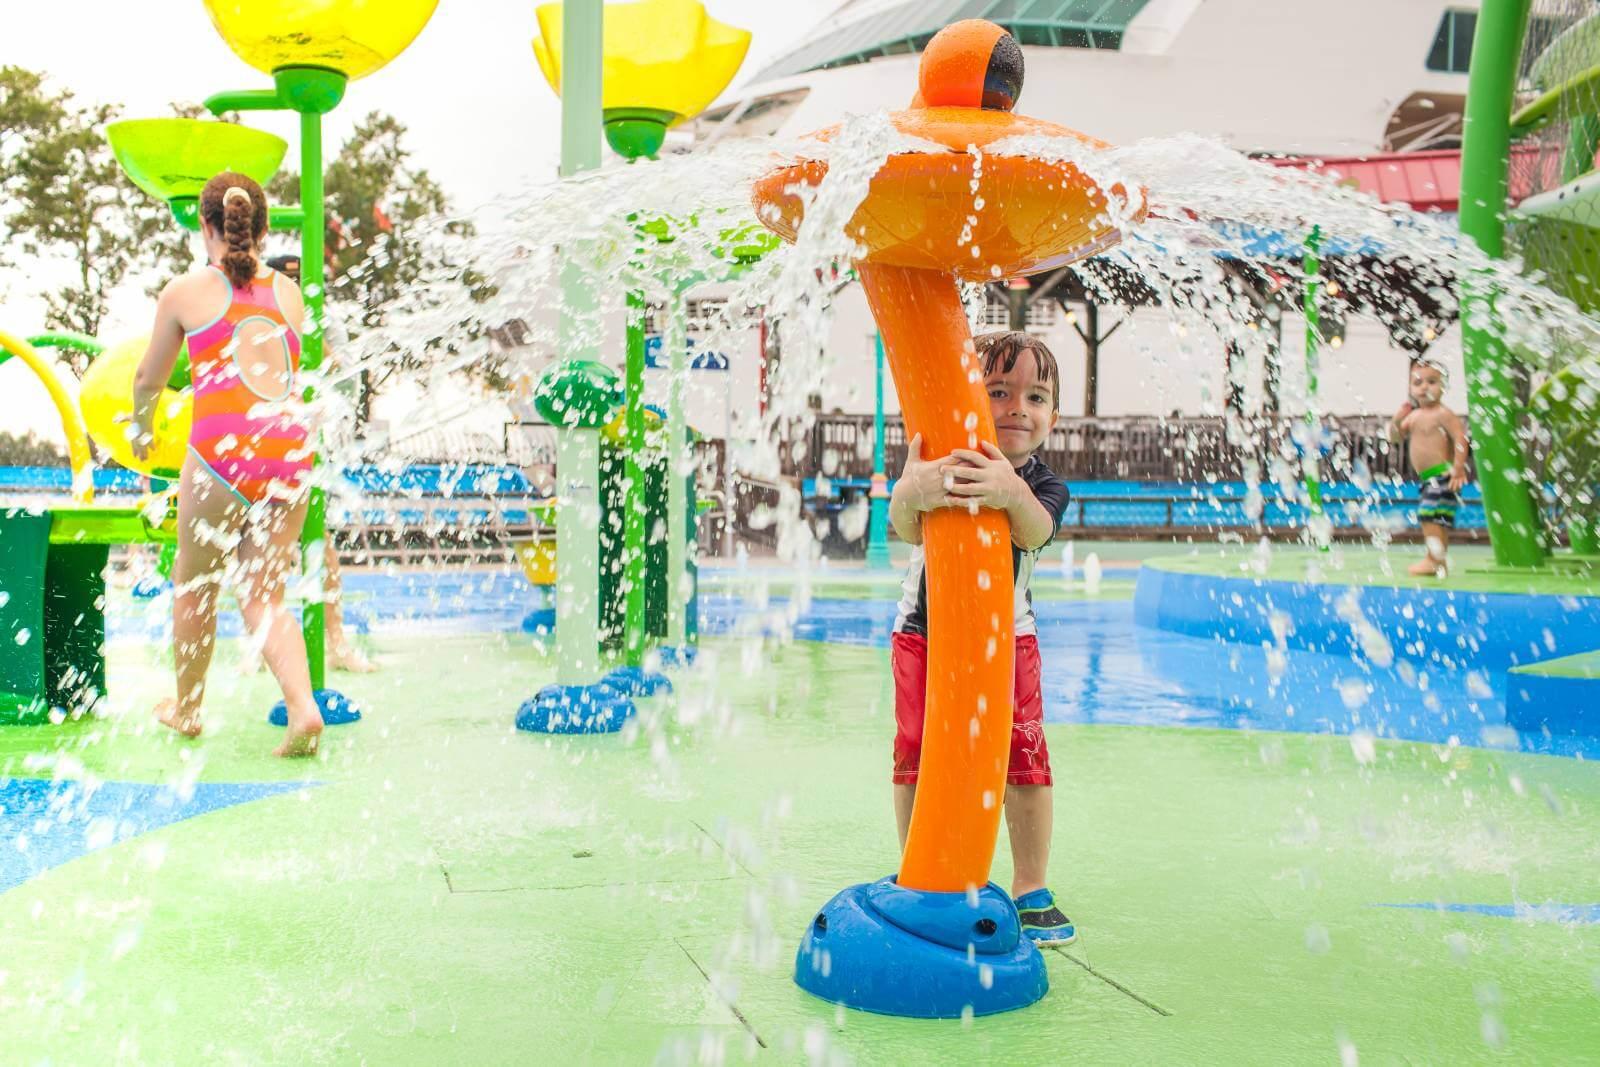 Kids at the splash pad water park and playground at The Florida Aquarium in Tampa.